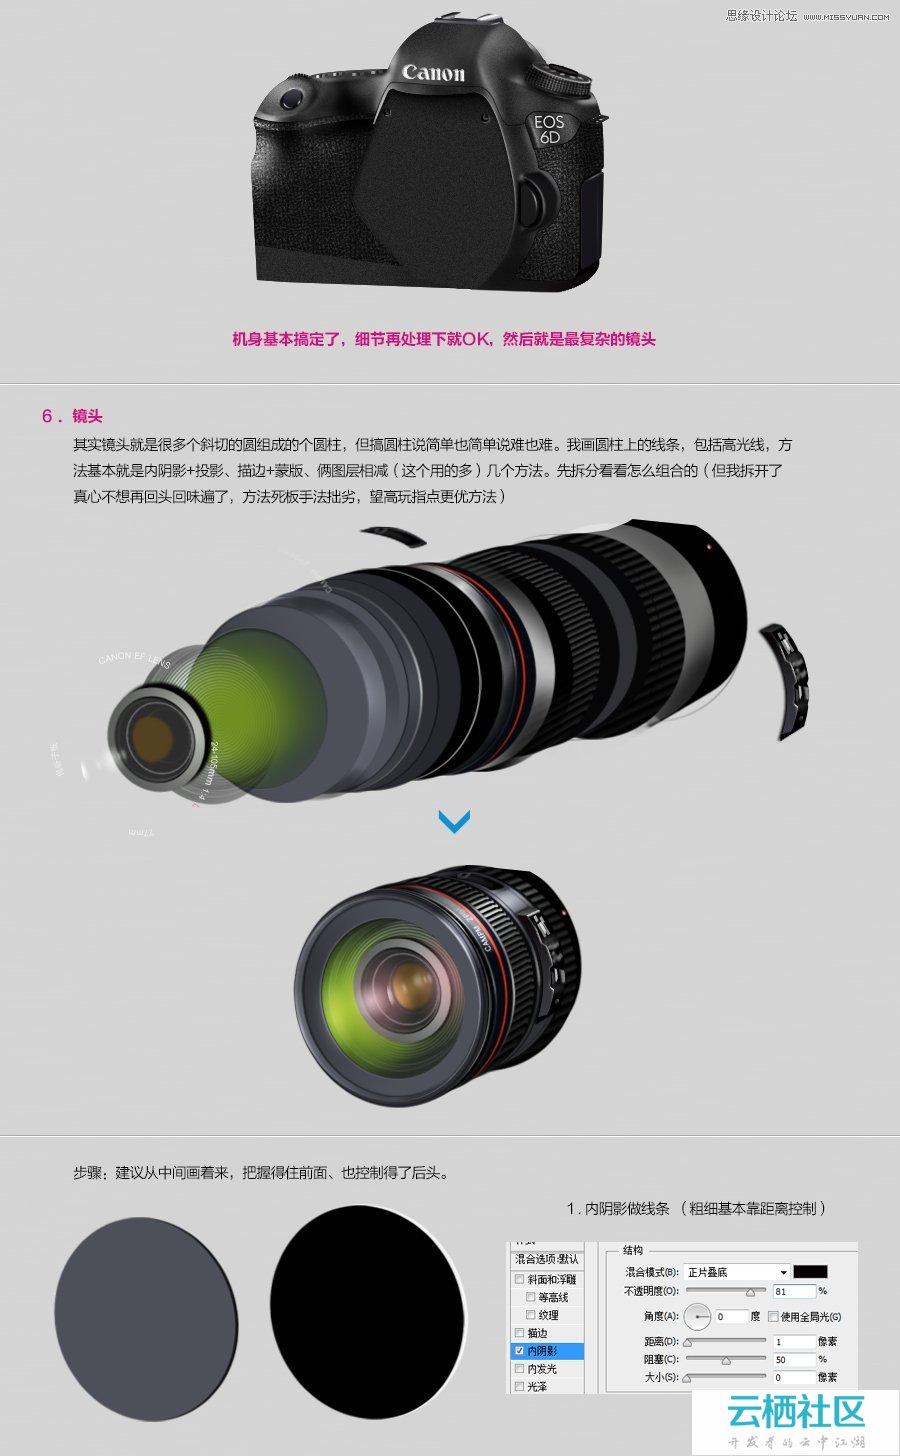 Photoshop绘制逼真的佳能6D单反相机教程-ps绘制逼真眼睛